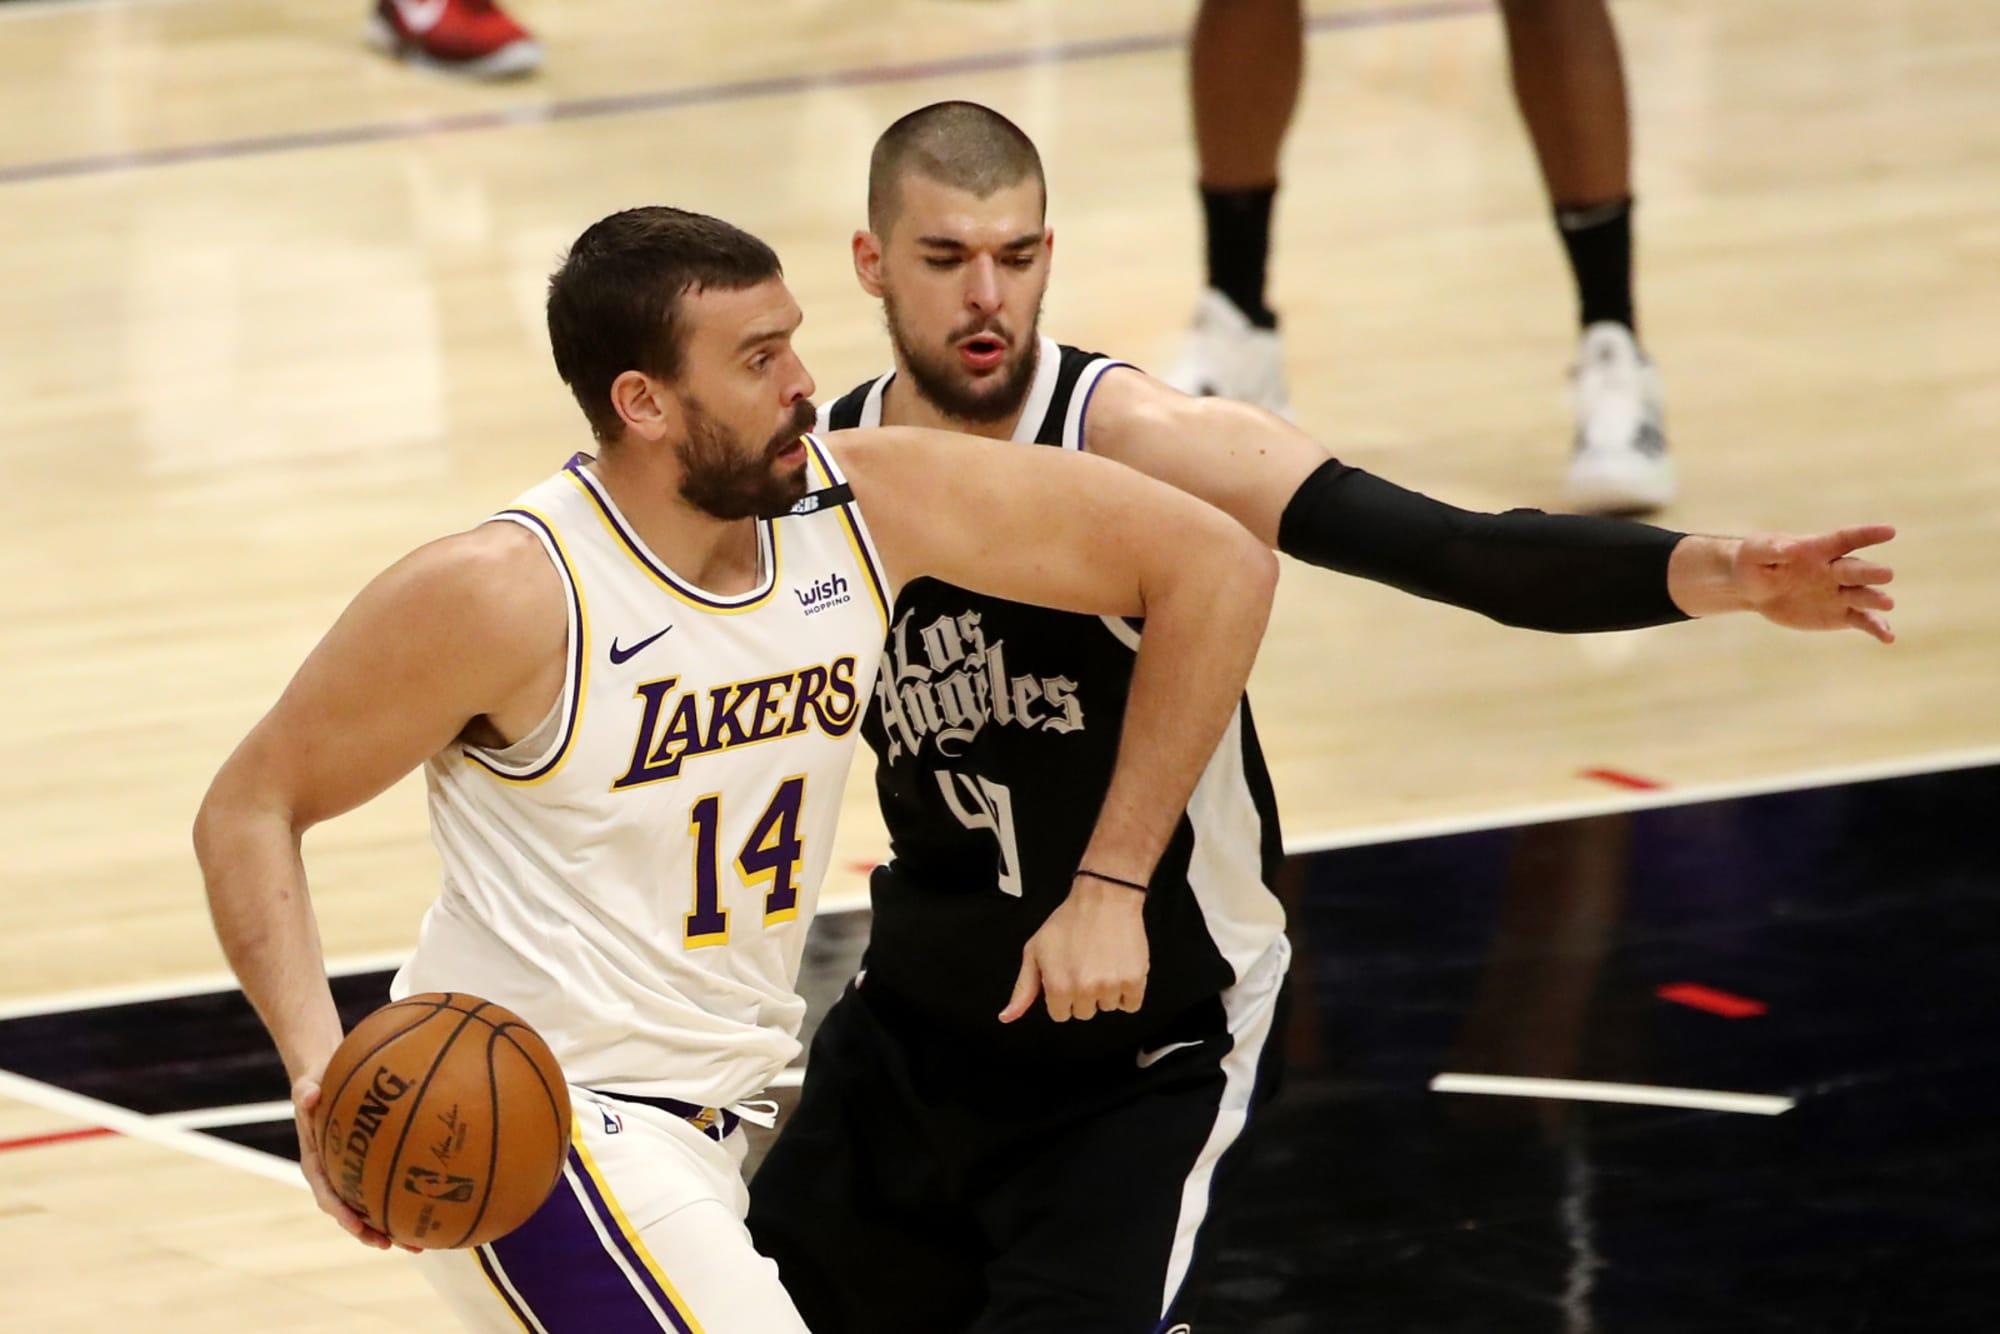 Toronto Raptors: Should the Raptors pursue a Marc Gasol reunion if the  Lakers buy him out? - Flipboard